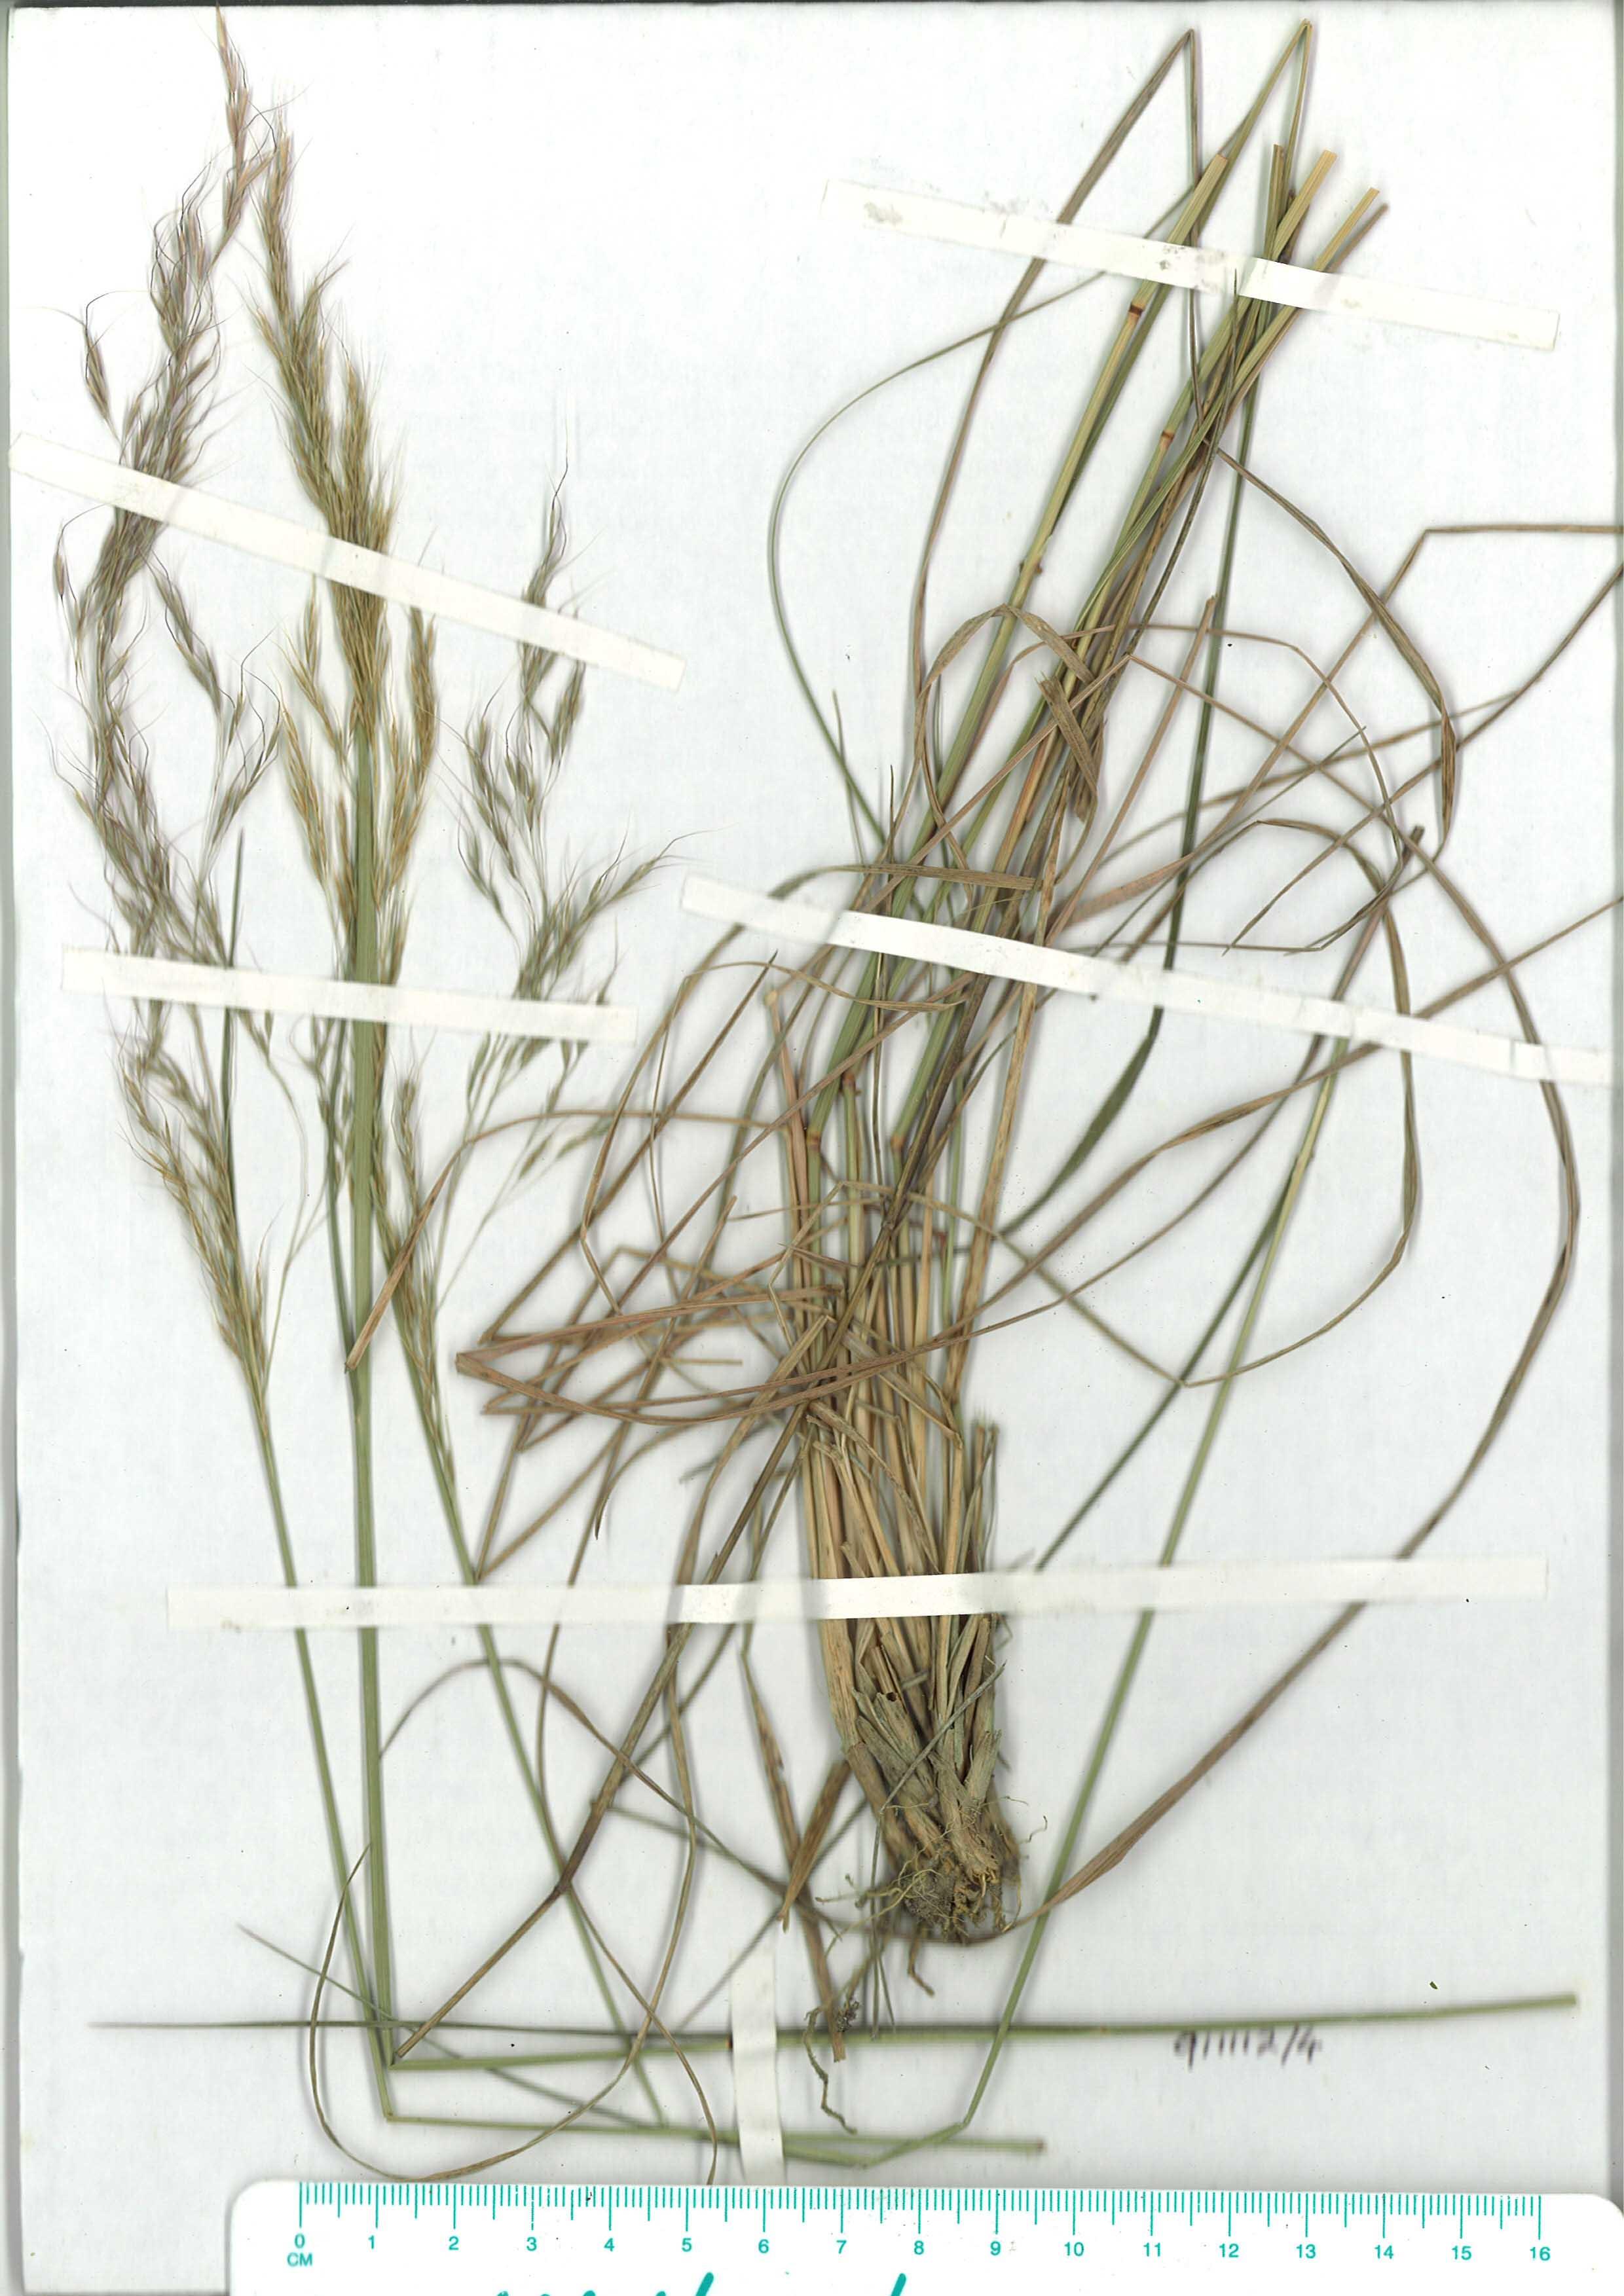 Scanned herbarium image of Dichelachne rara